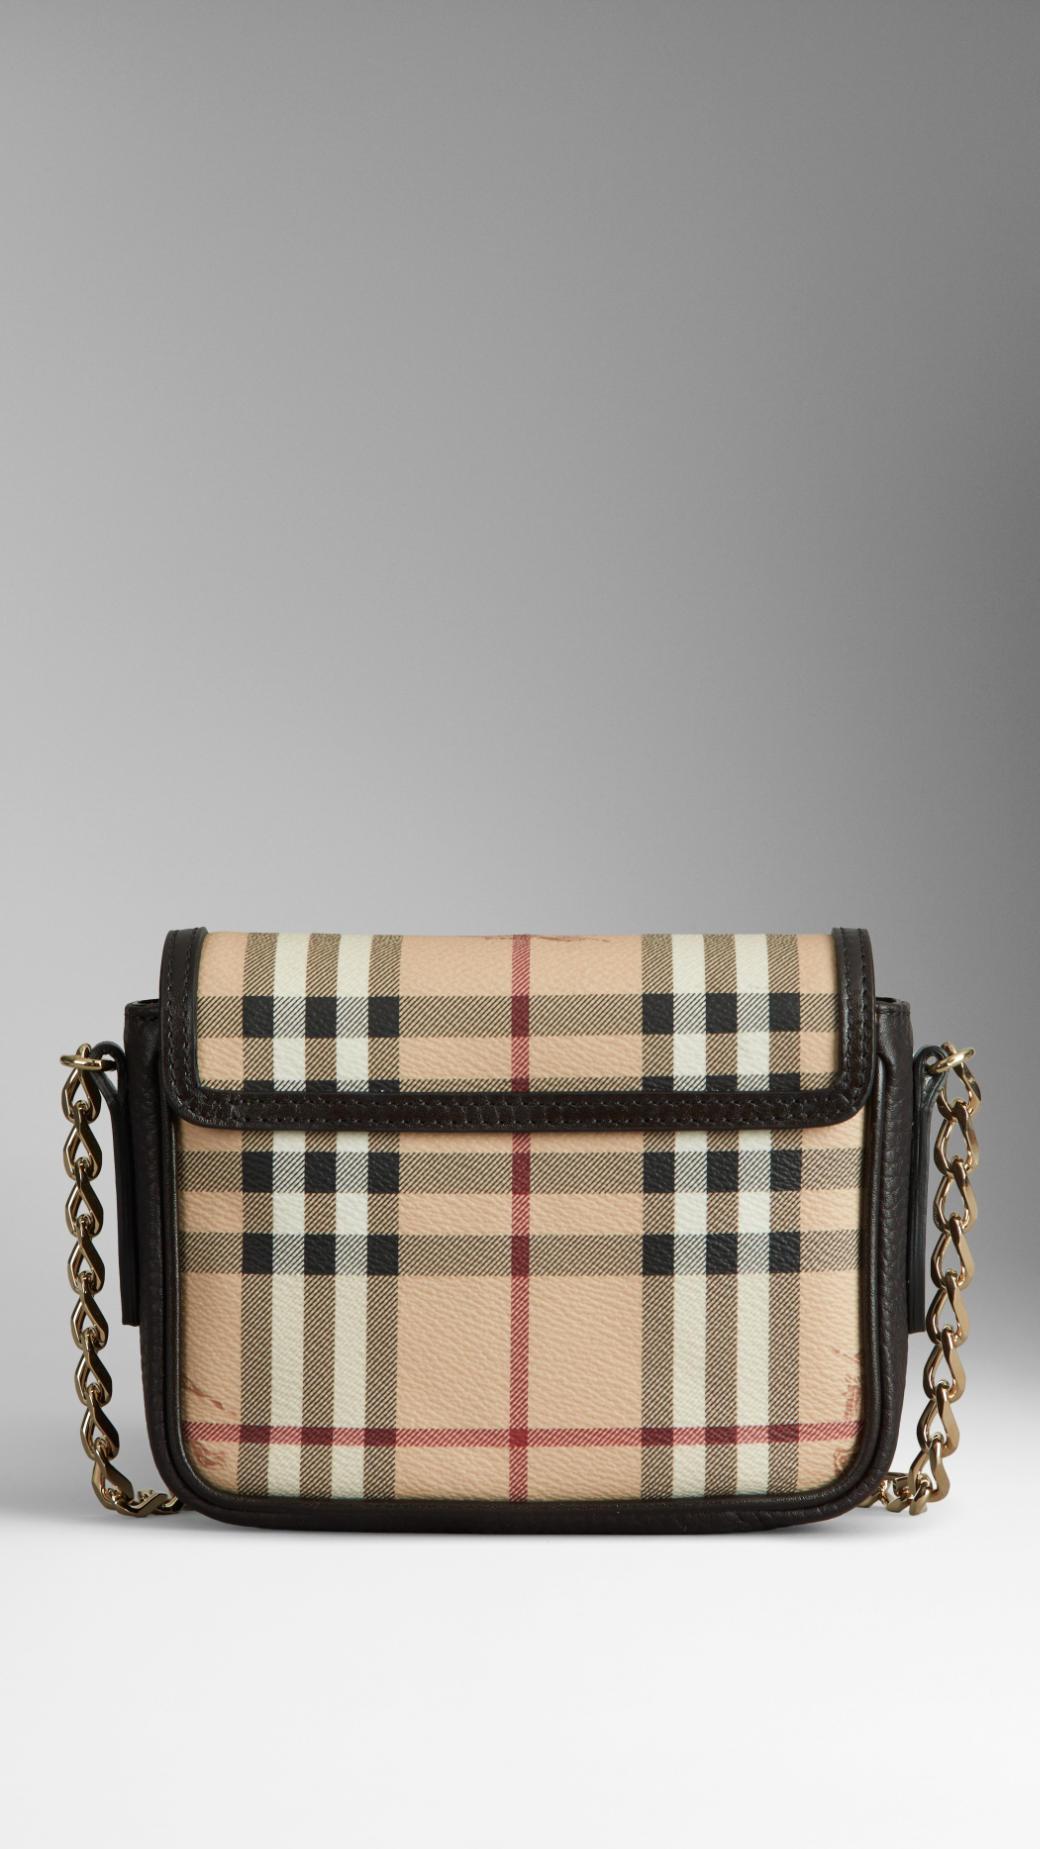 Burberry Tassel Crossbody Bag